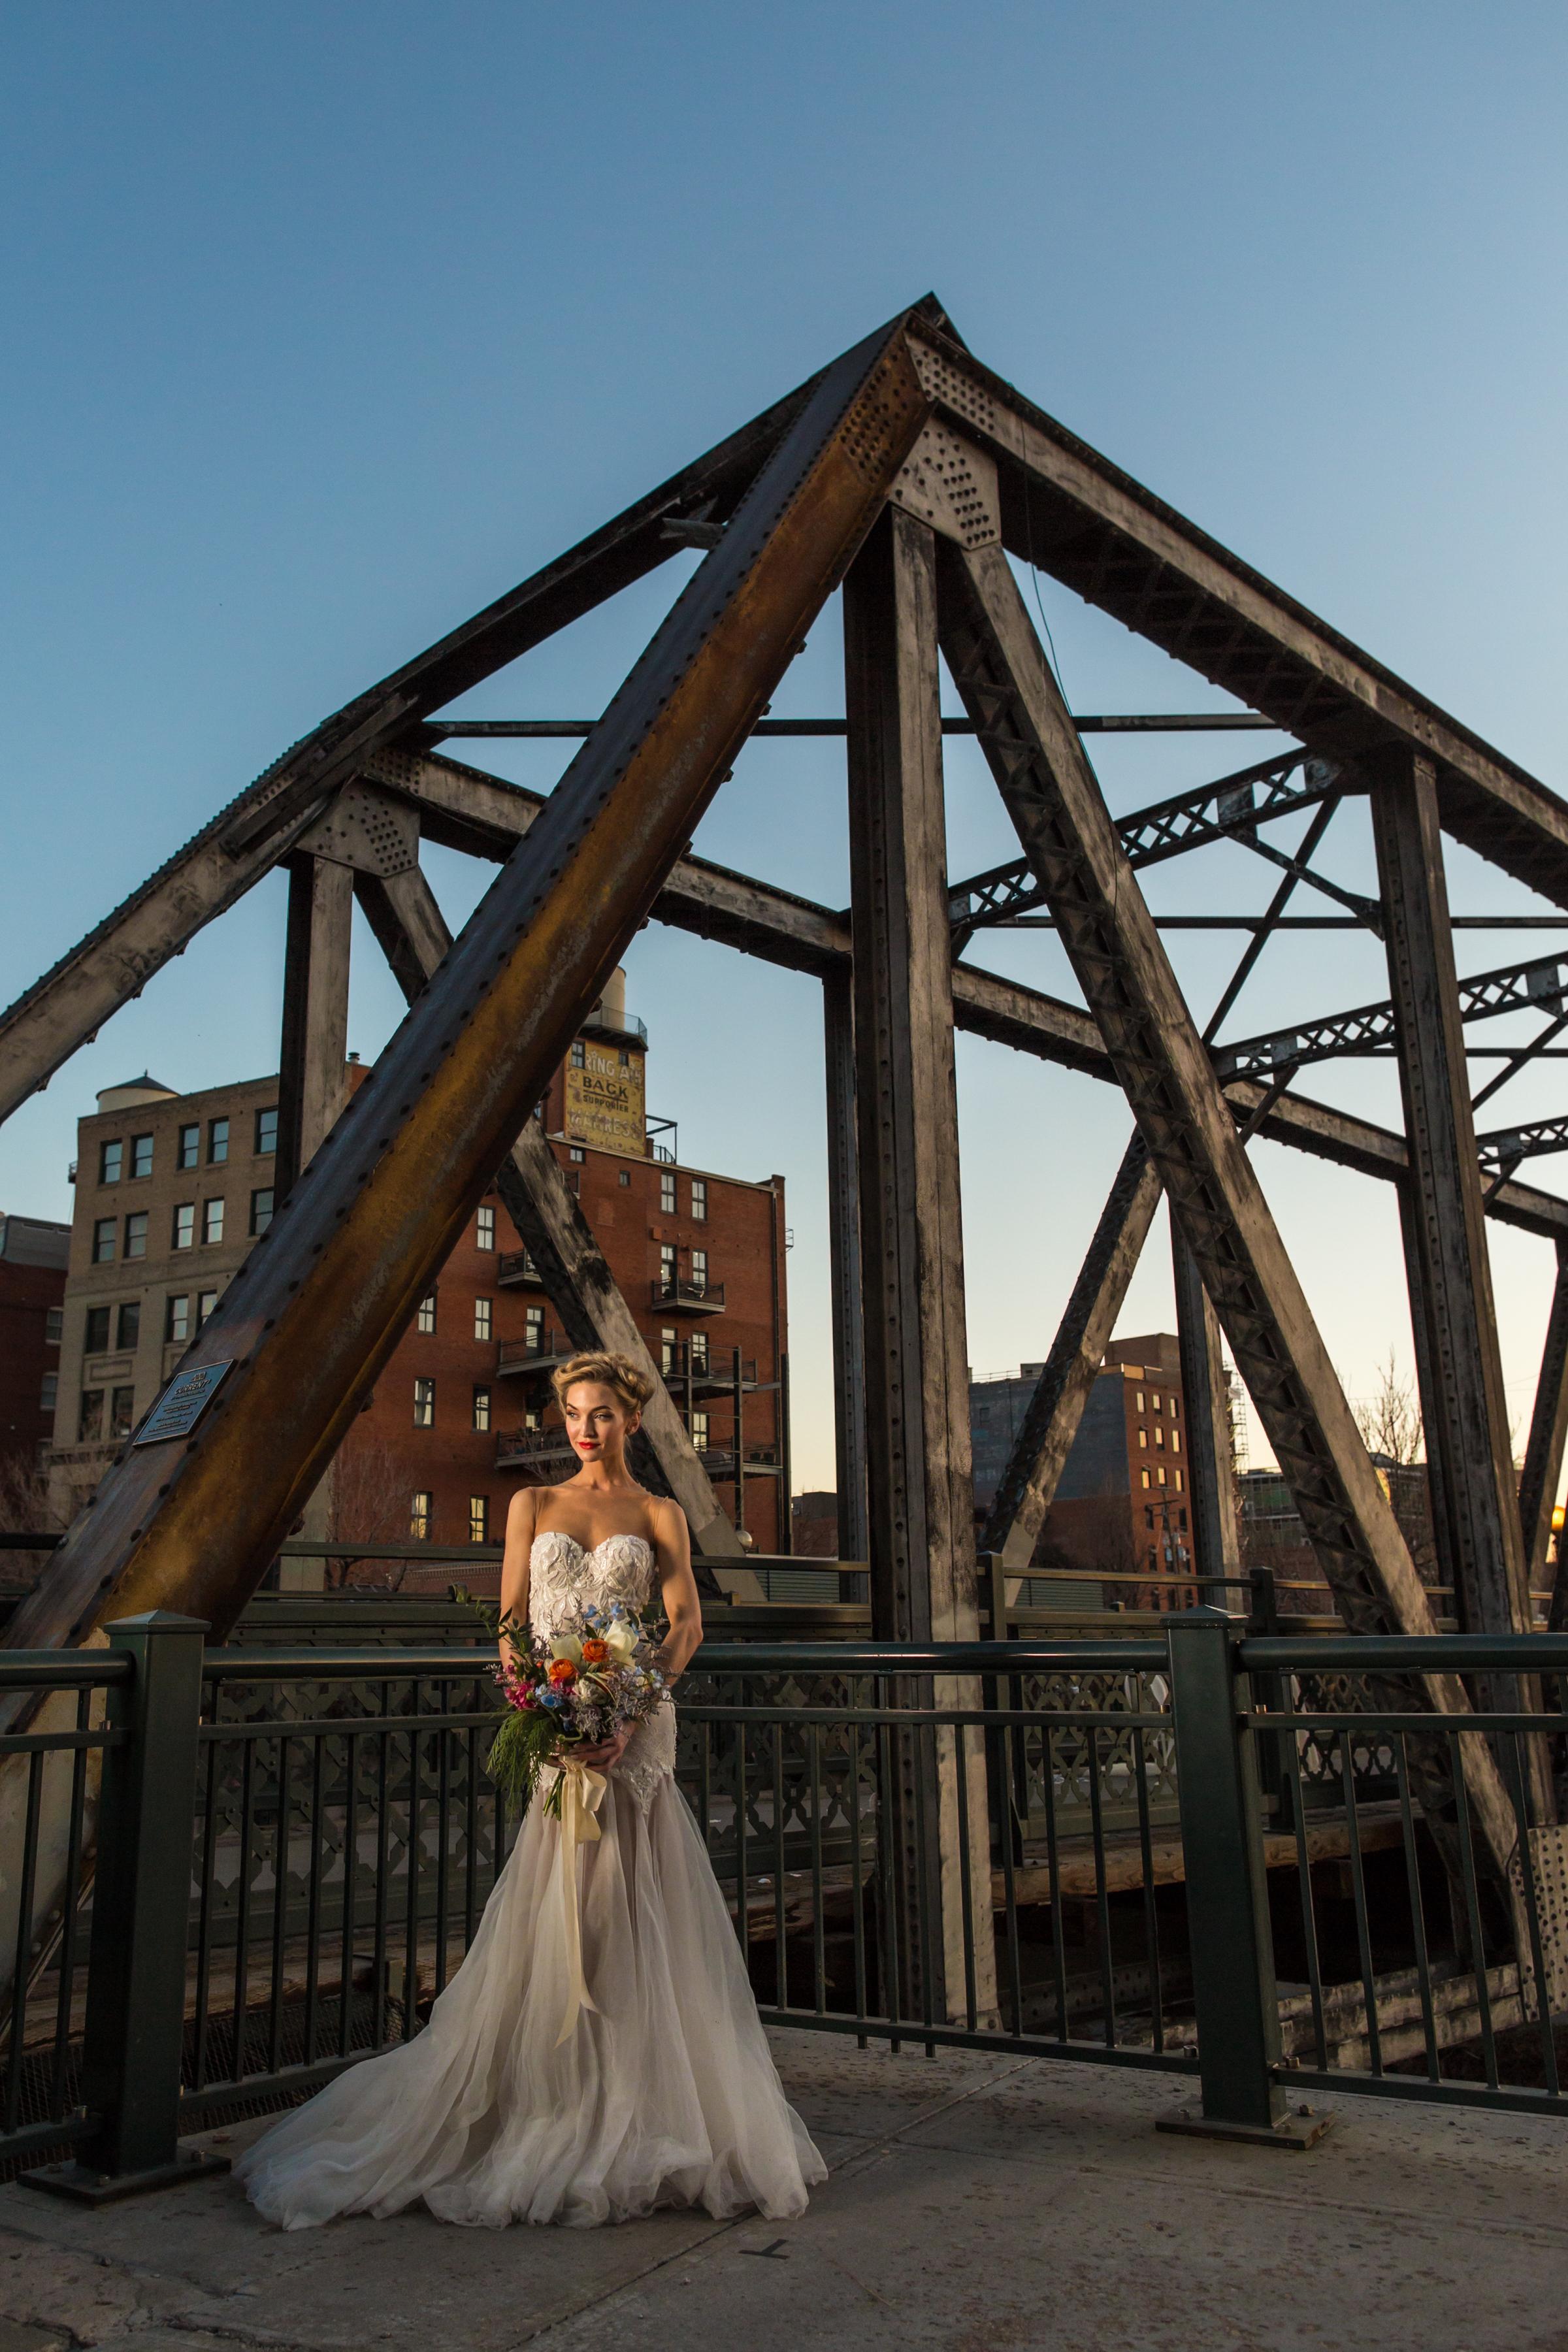 20160226-Moss-Denver-Aldabella-Photography-Milk-Glass-Production-0143.jpg